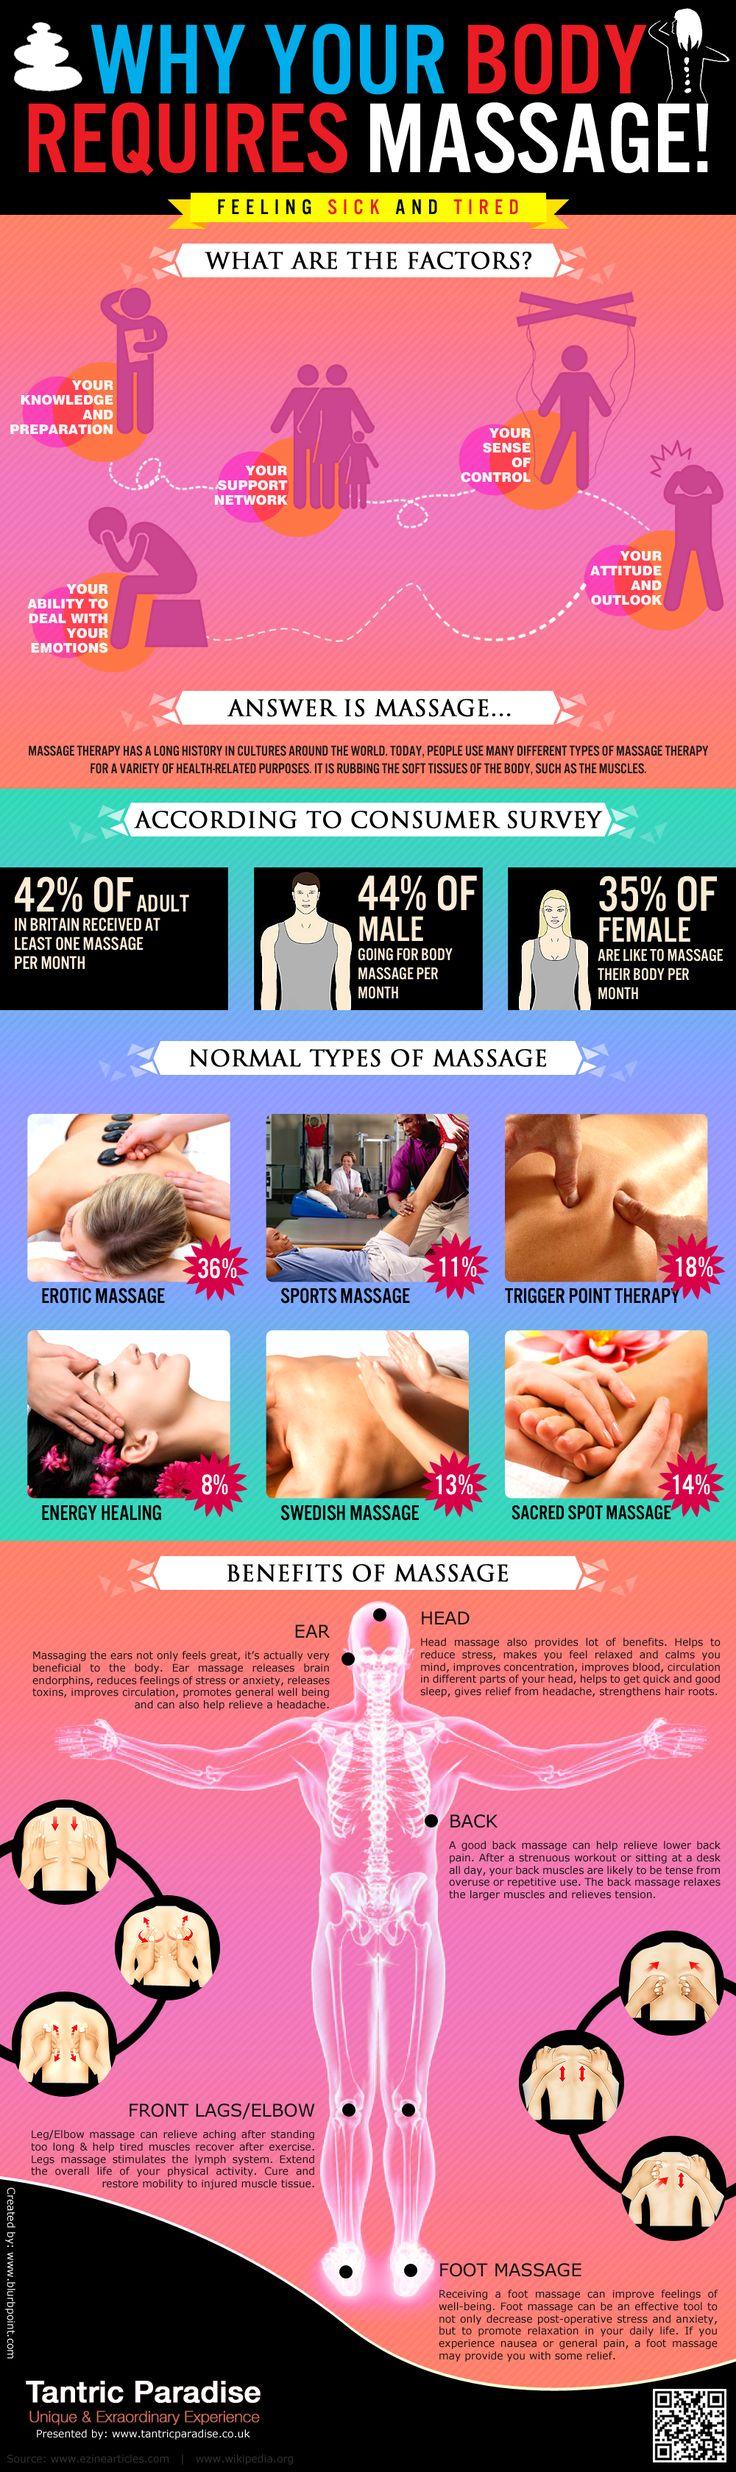 Massage- Its Ultimate Health Benefits